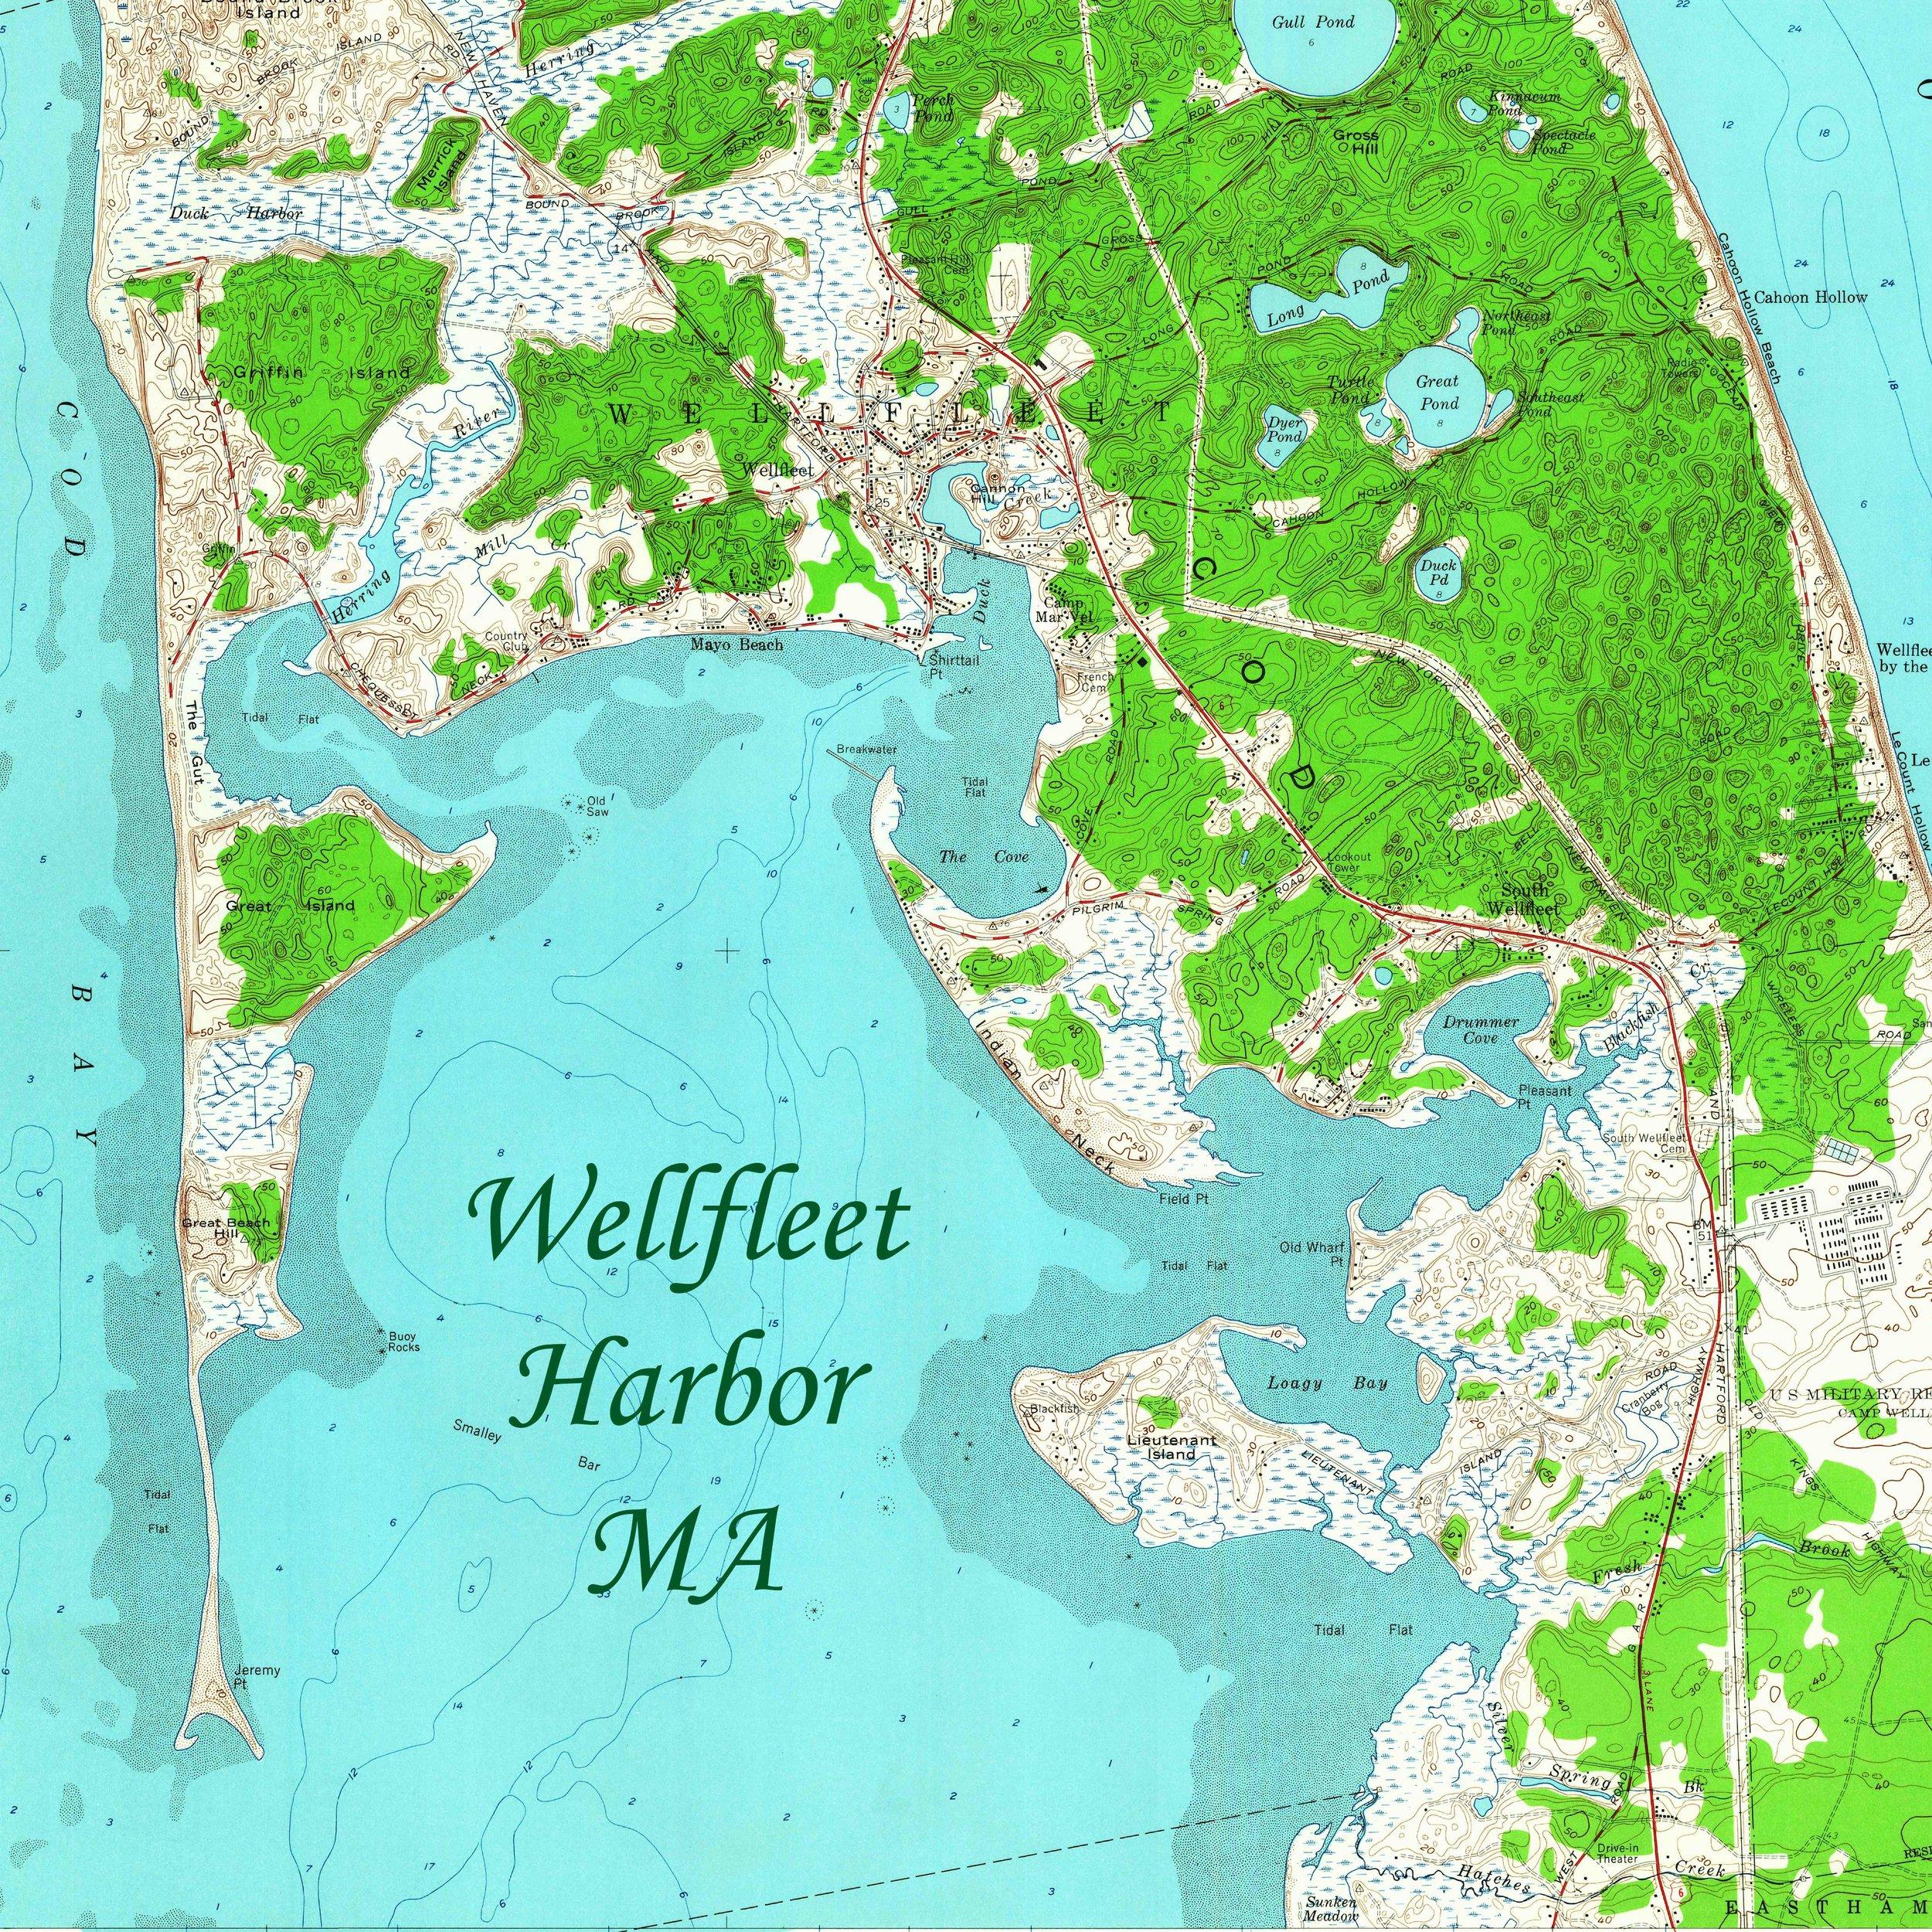 wellfleet square.jpg